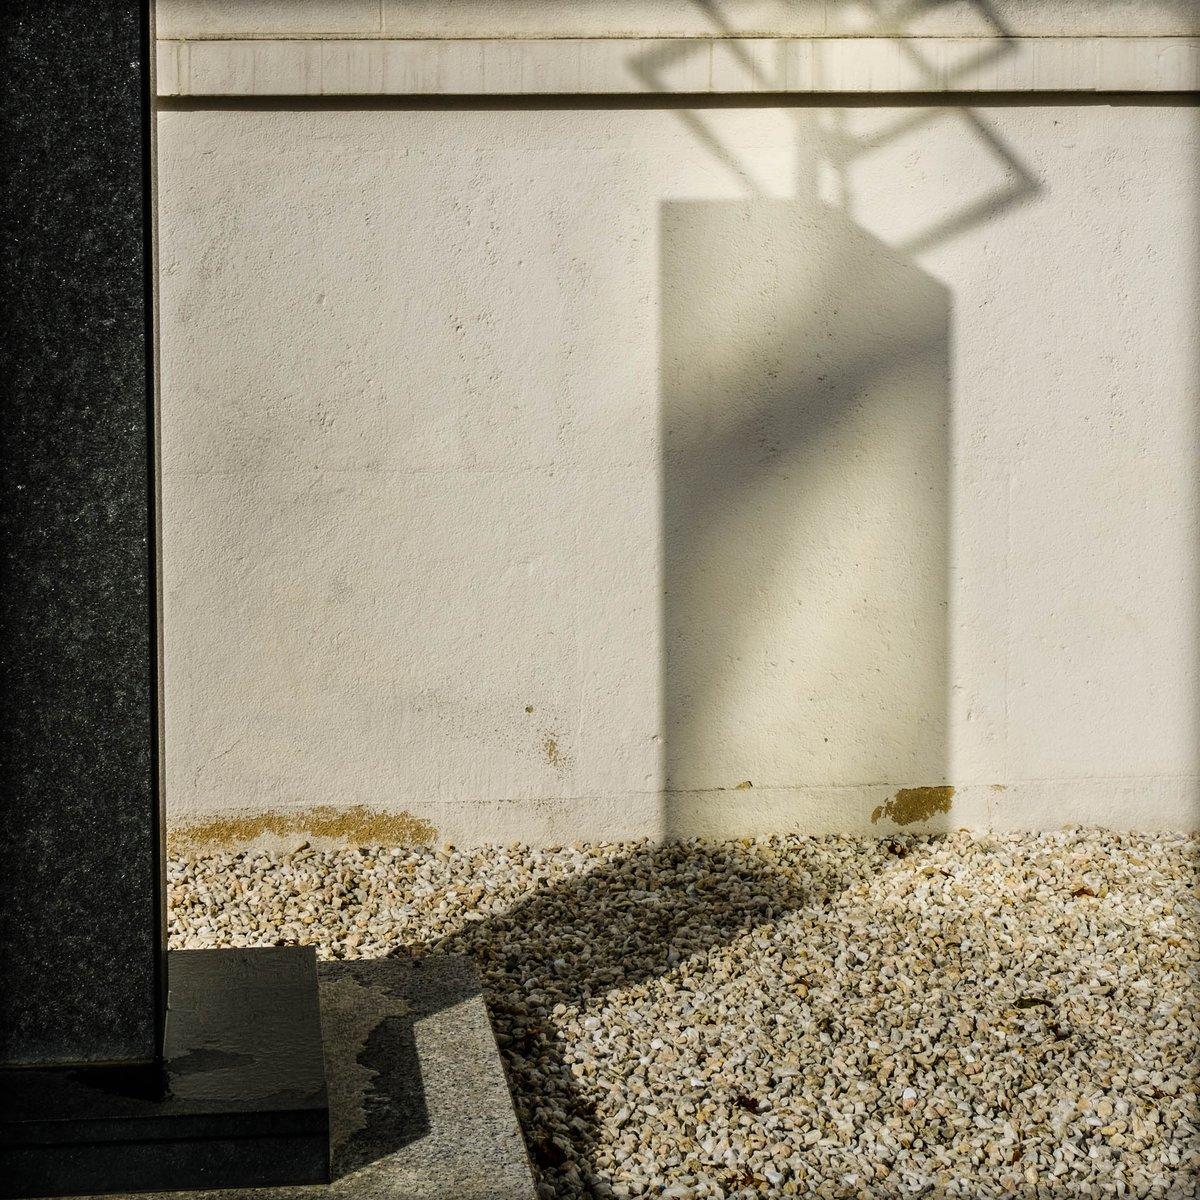 #bobbiandleesphotoadventures with light and shadow in #vienna  #chasinglight #toldwithexposure #minimalist #minimalism #minimal_shots #fujixt3   #velvia  #fujifilm #fujifilmus  #fujifilmx_us #myfujifilmlegacy #artphotography #fineartphotography #ihavethisthingwithshadowspic.twitter.com/9HGiOeroCQ